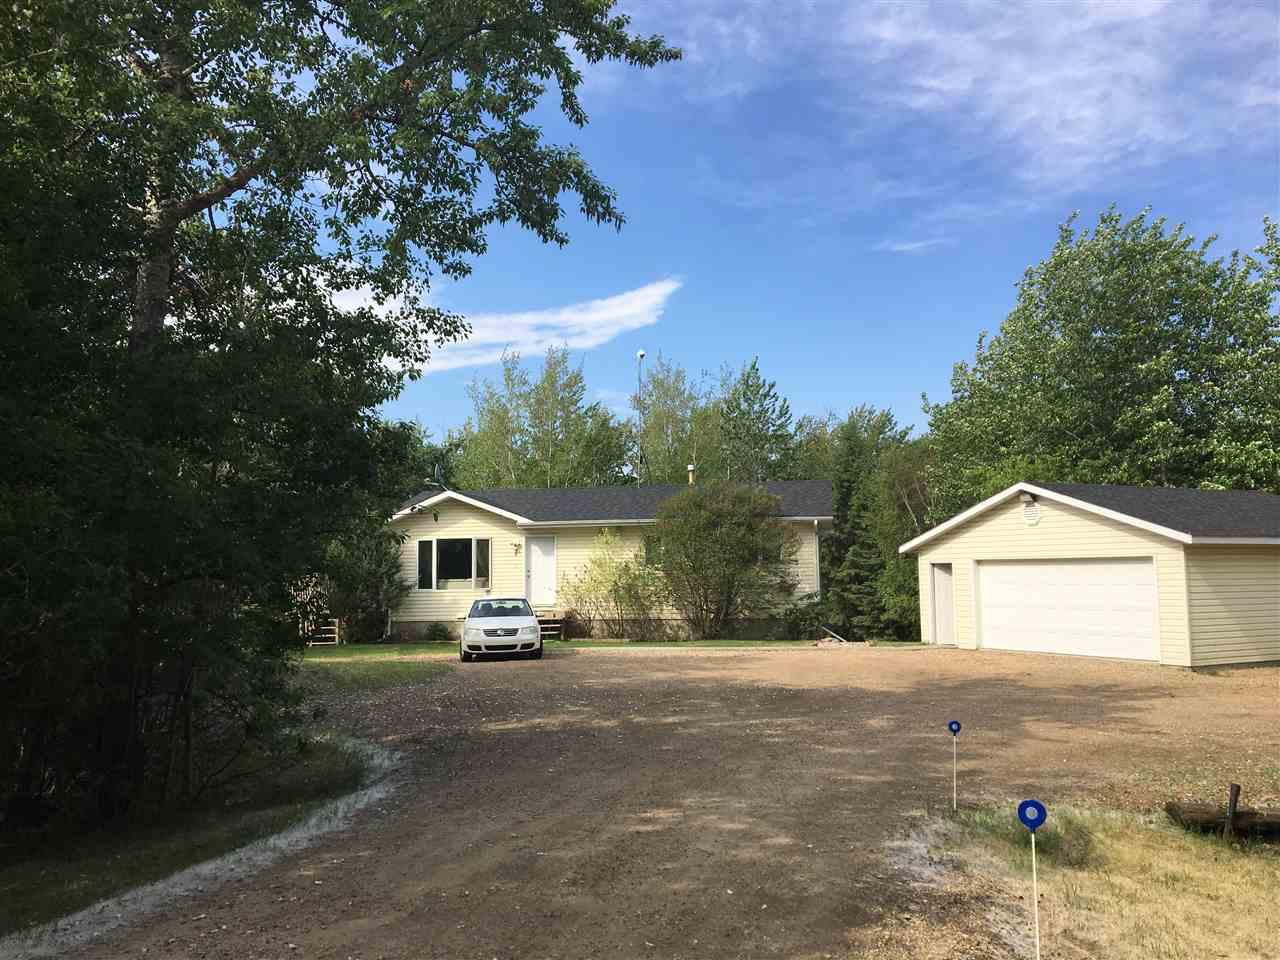 55054 Rge Rd 213, Rural Strathcona County, MLS® # E4152560